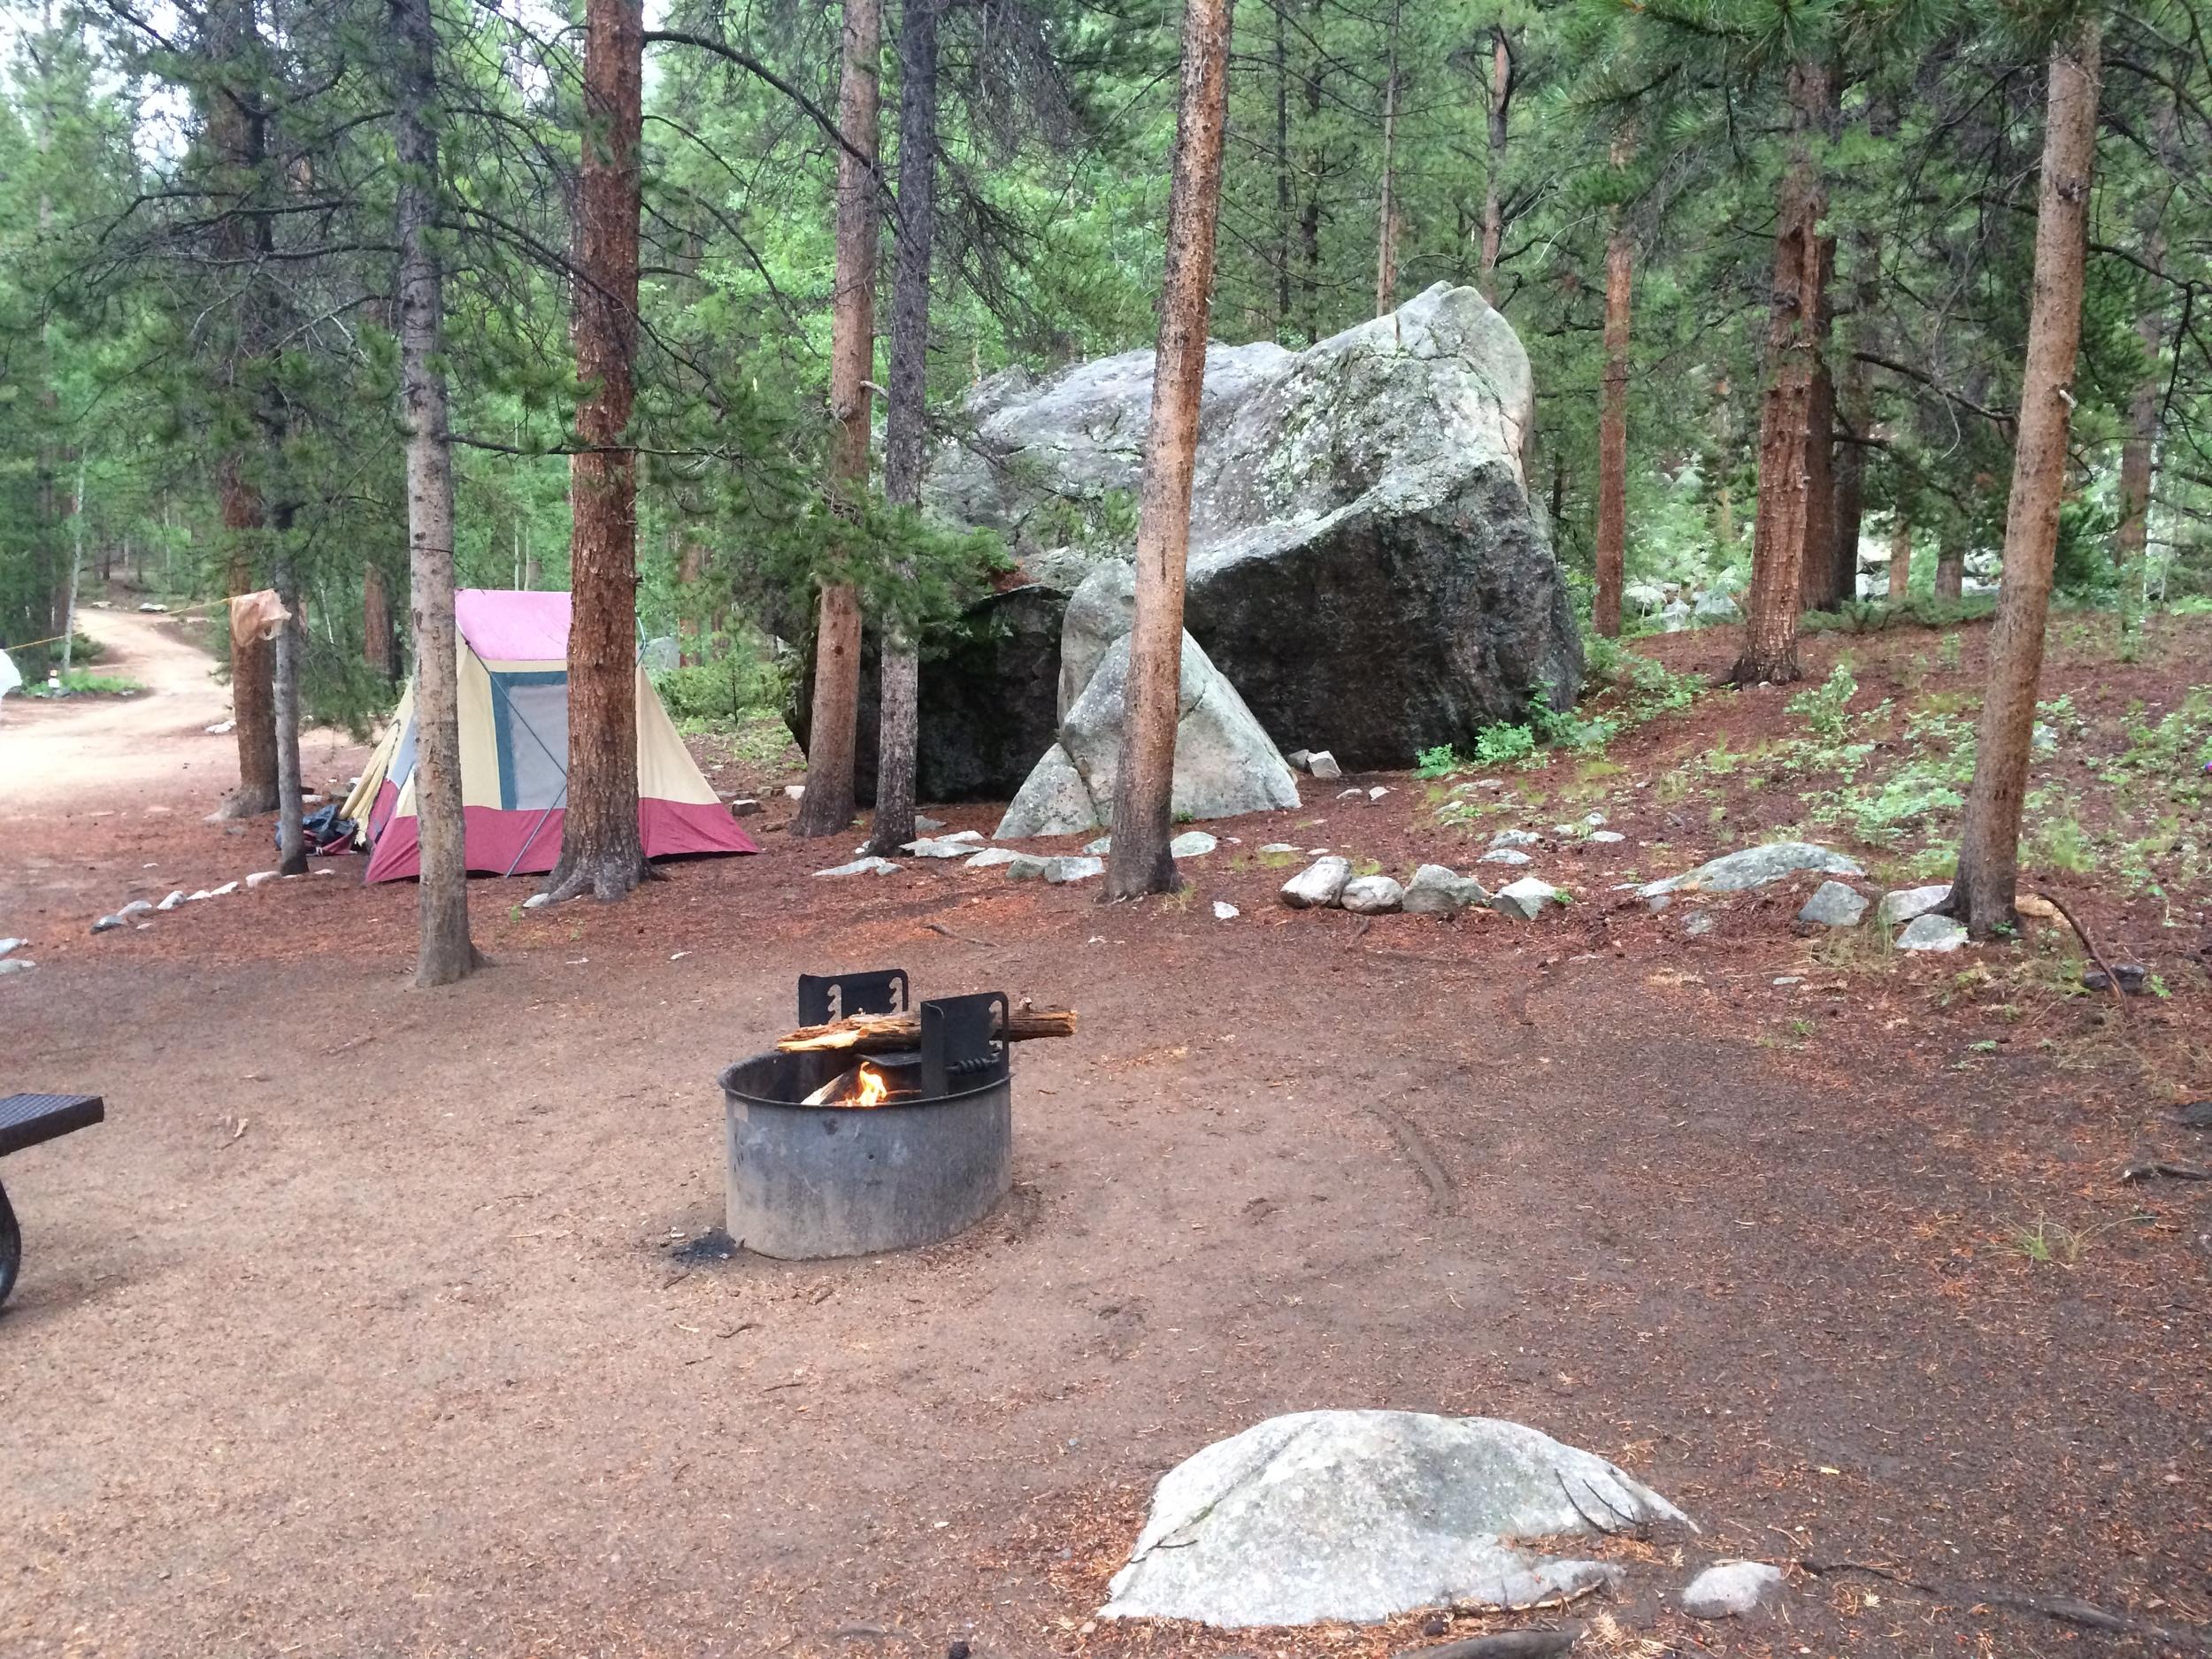 Campsite #10 Lodgepole Campground - Gunnison County